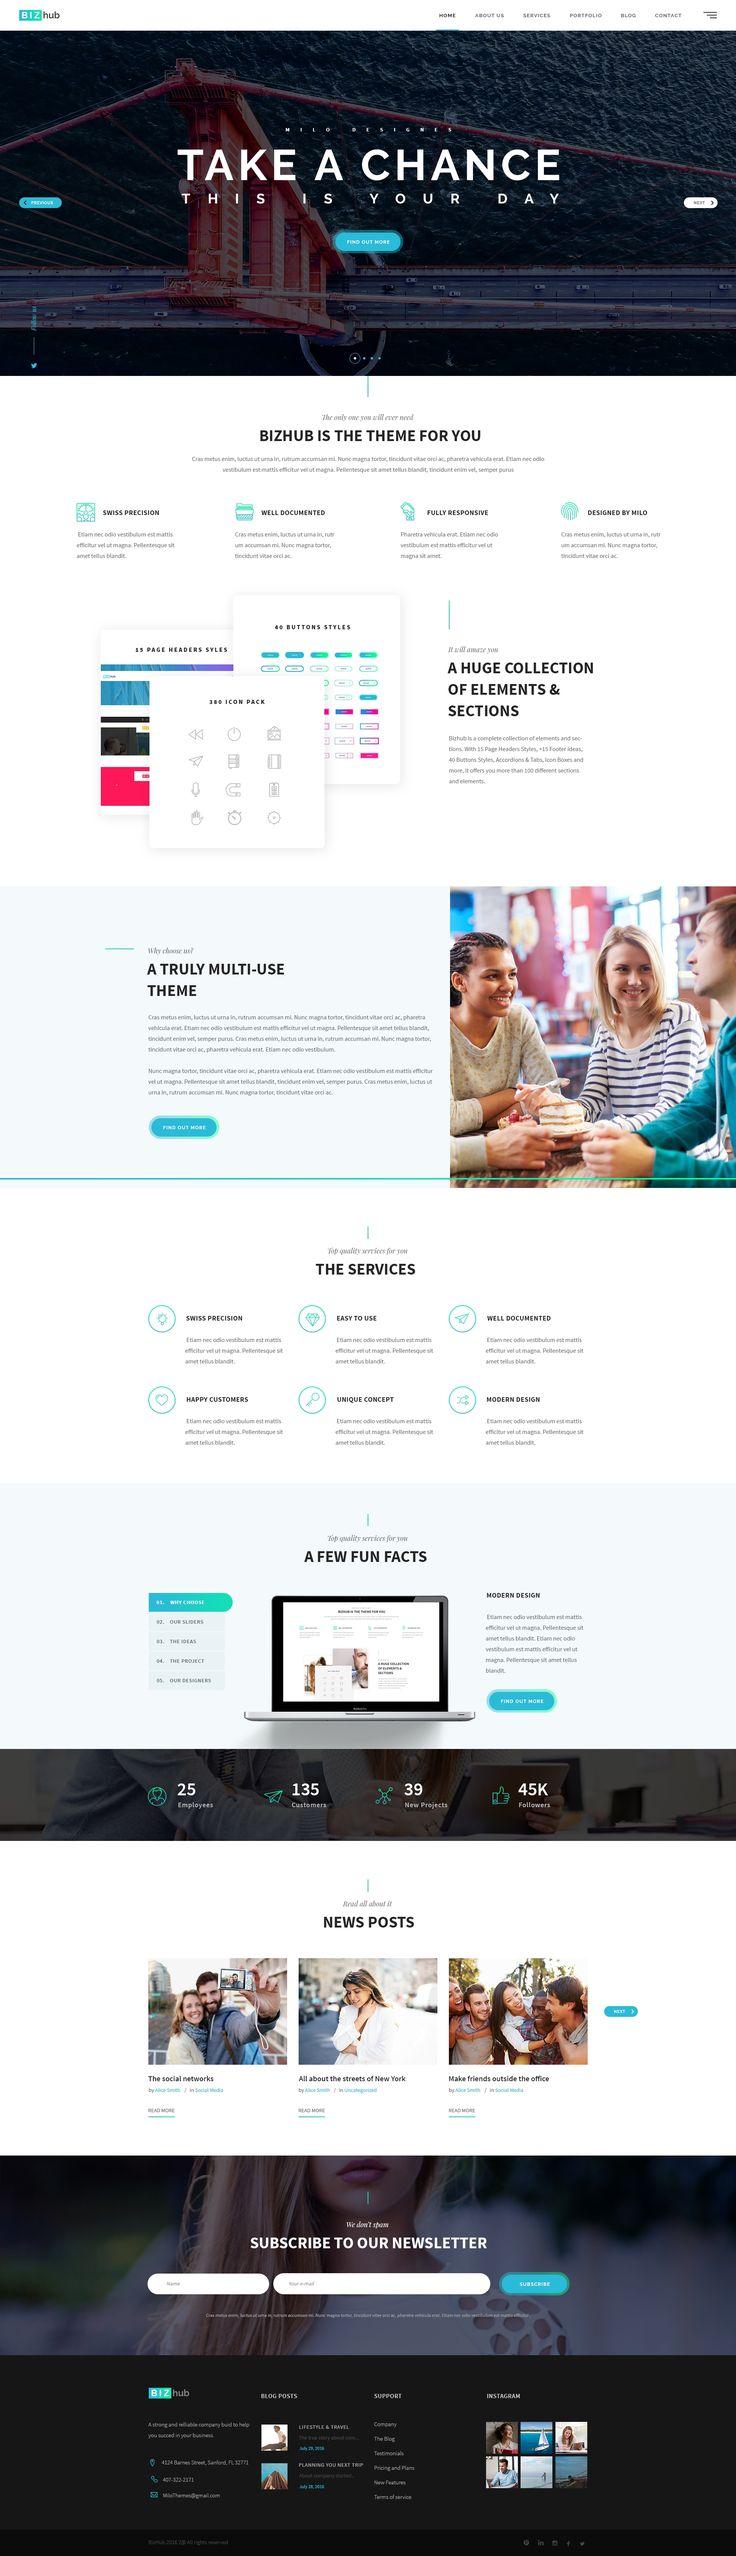 BIZhub - Mega PSD Pack #web design #business website #website • Download ➝ https://themeforest.net/item/bizhub-mega-psd-pack/17768037?ref=pxcr